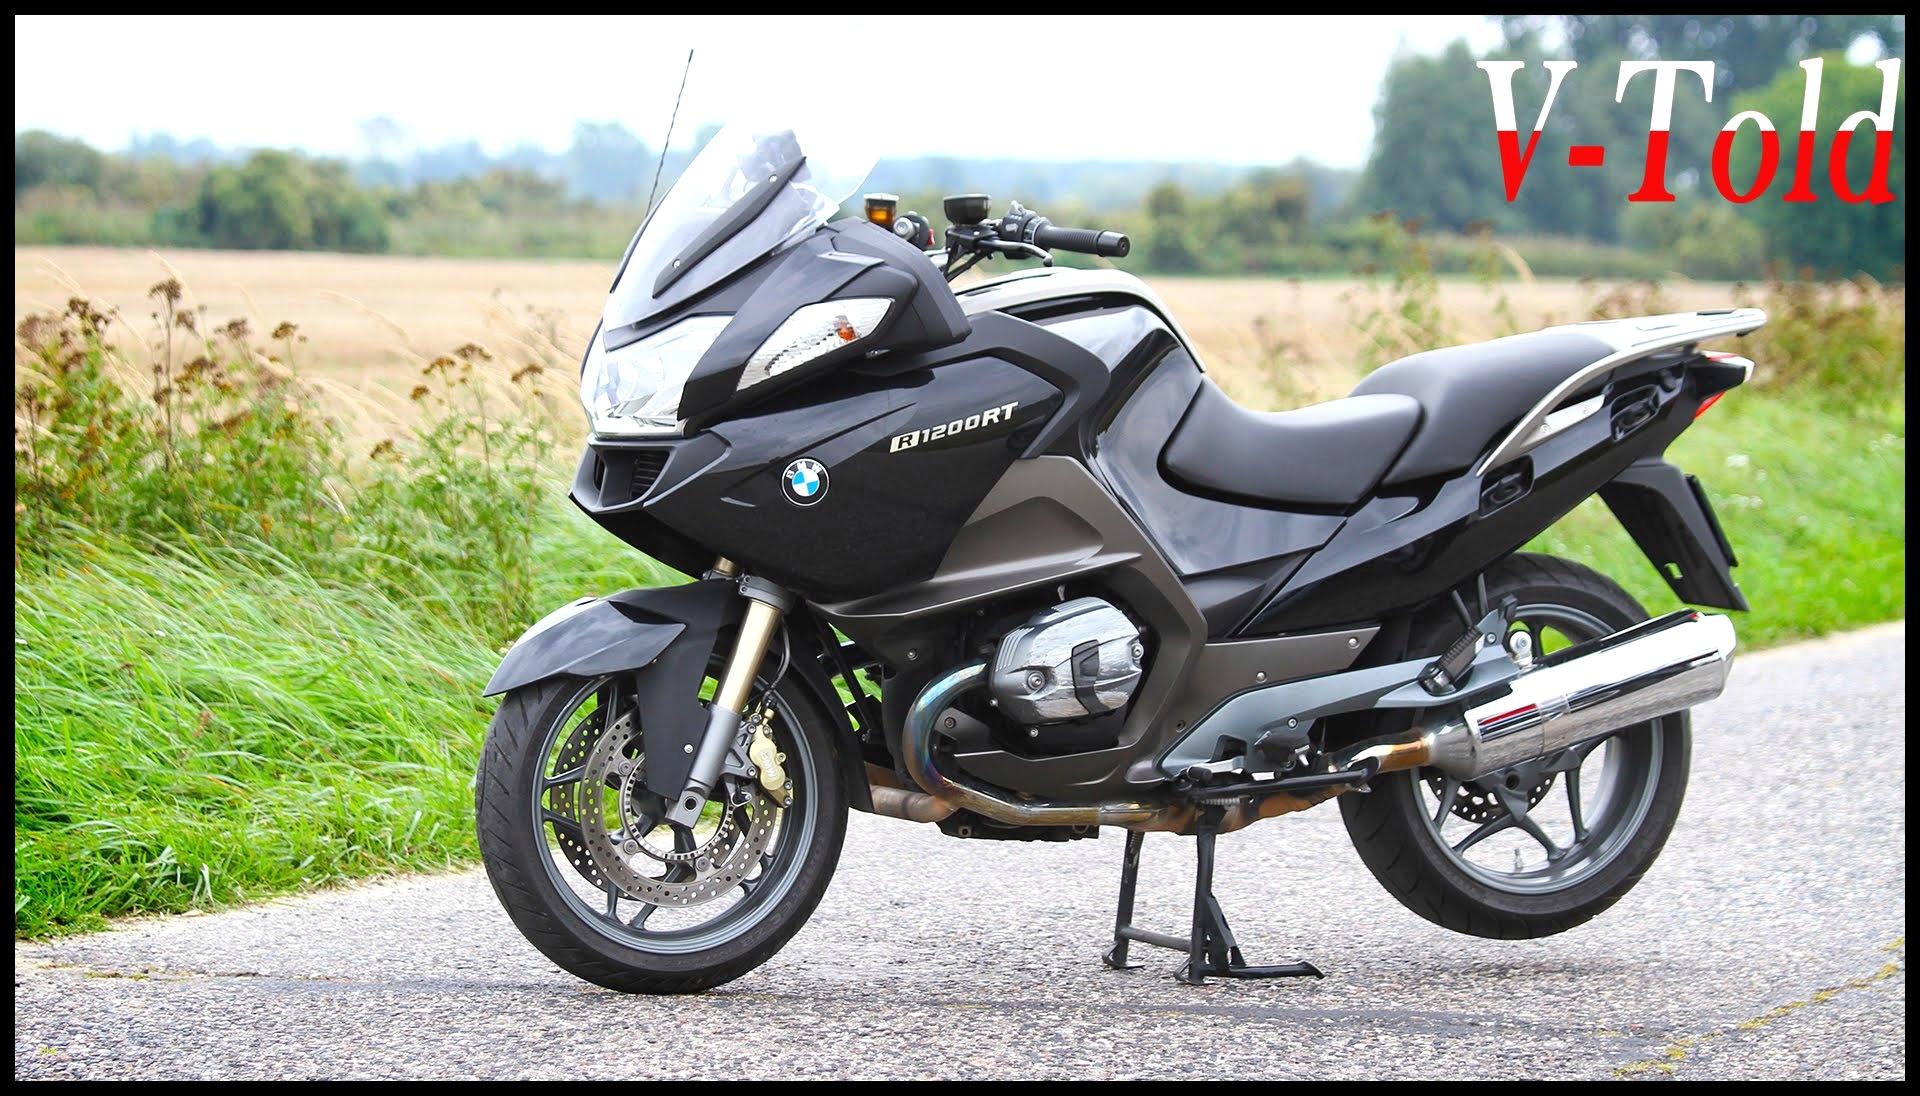 South sound Bmw Motorcycles Ta a Lovely Bmw R 1200 R sound Bmw R 1200 Gs Riding